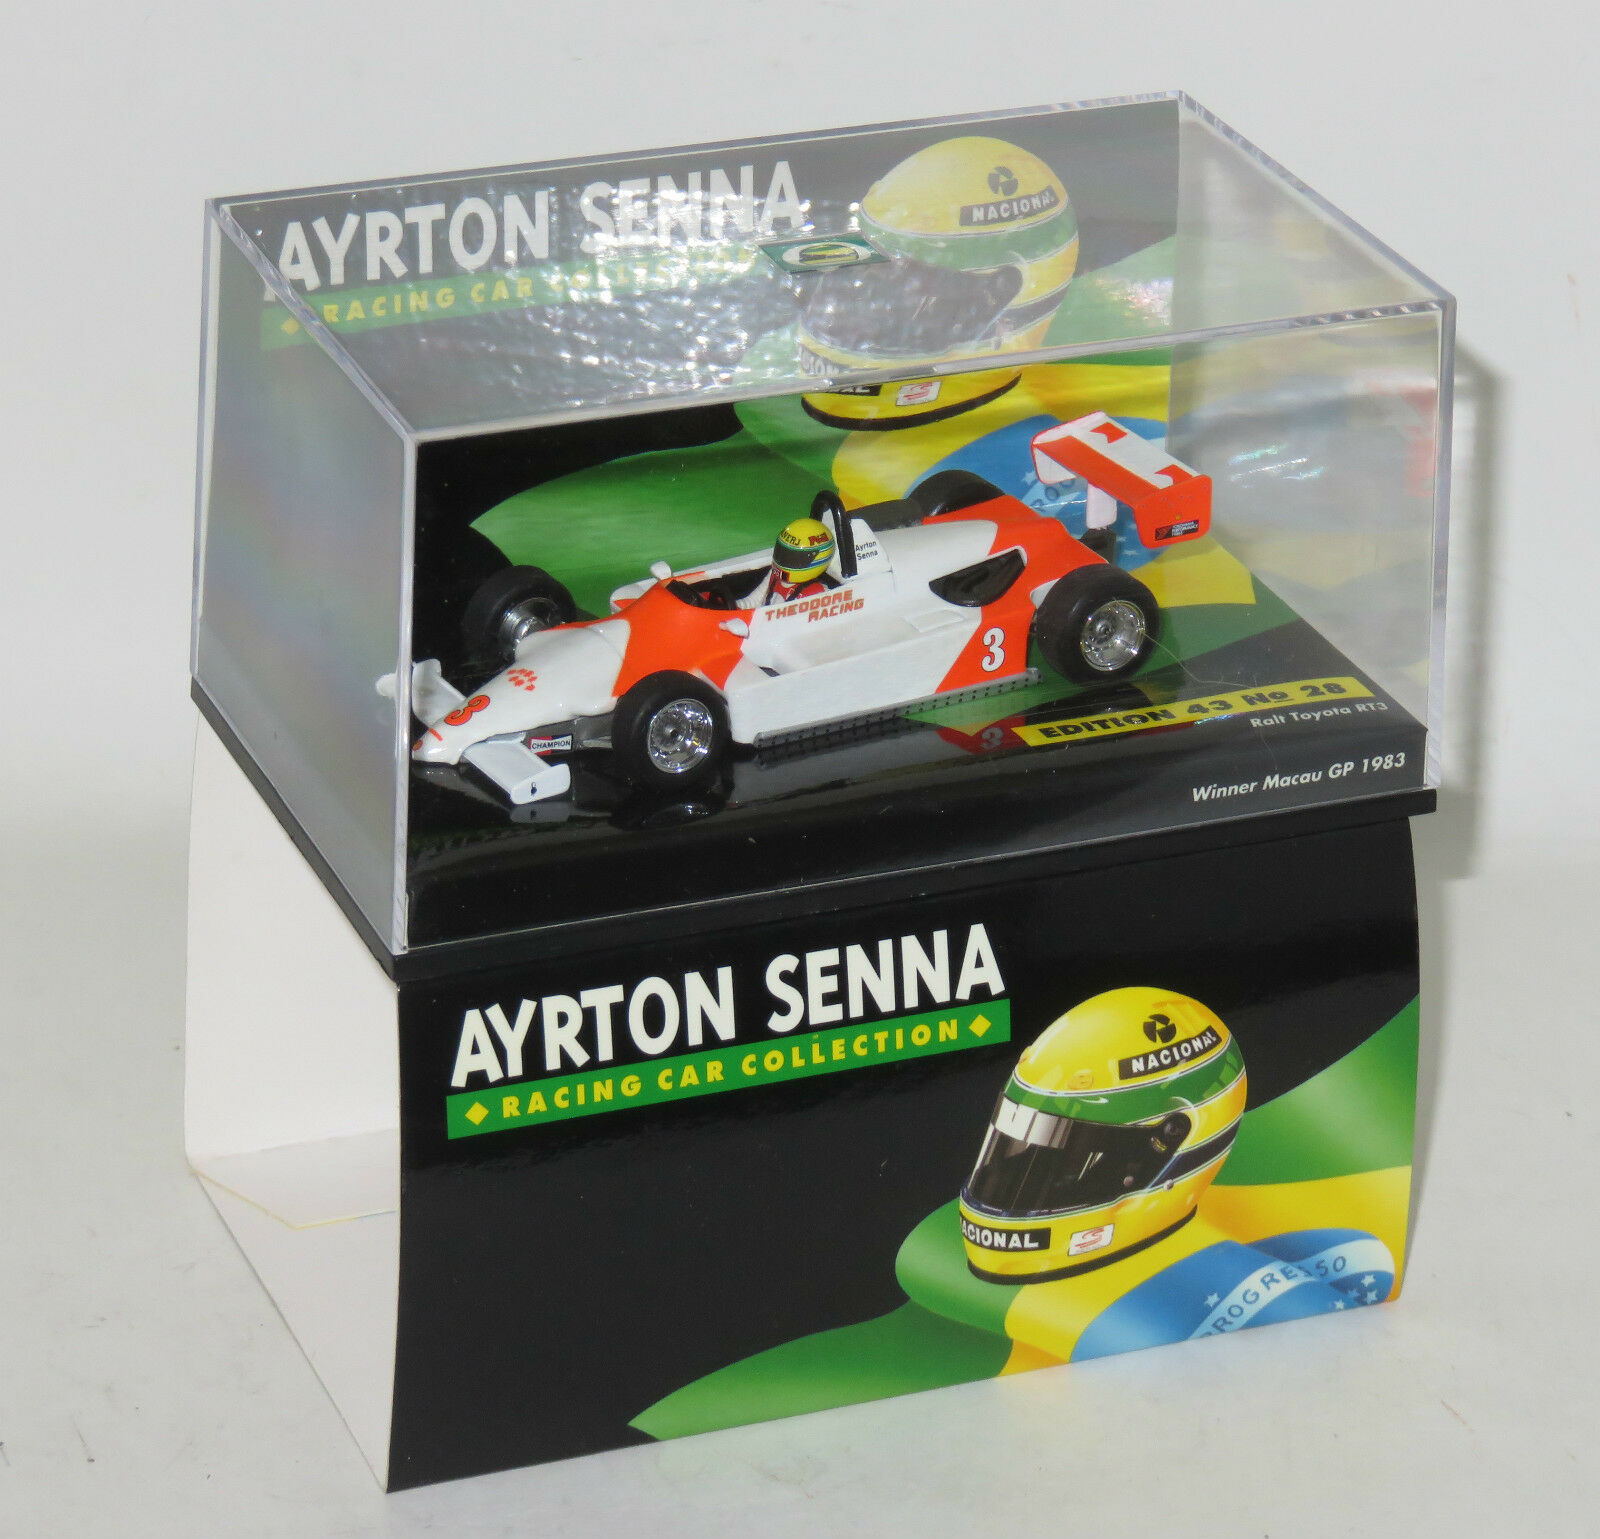 1 43 Ayrton Senna Winner Macau GP  1983 RALT TOYOTA RT3 collection no.28  sports chauds